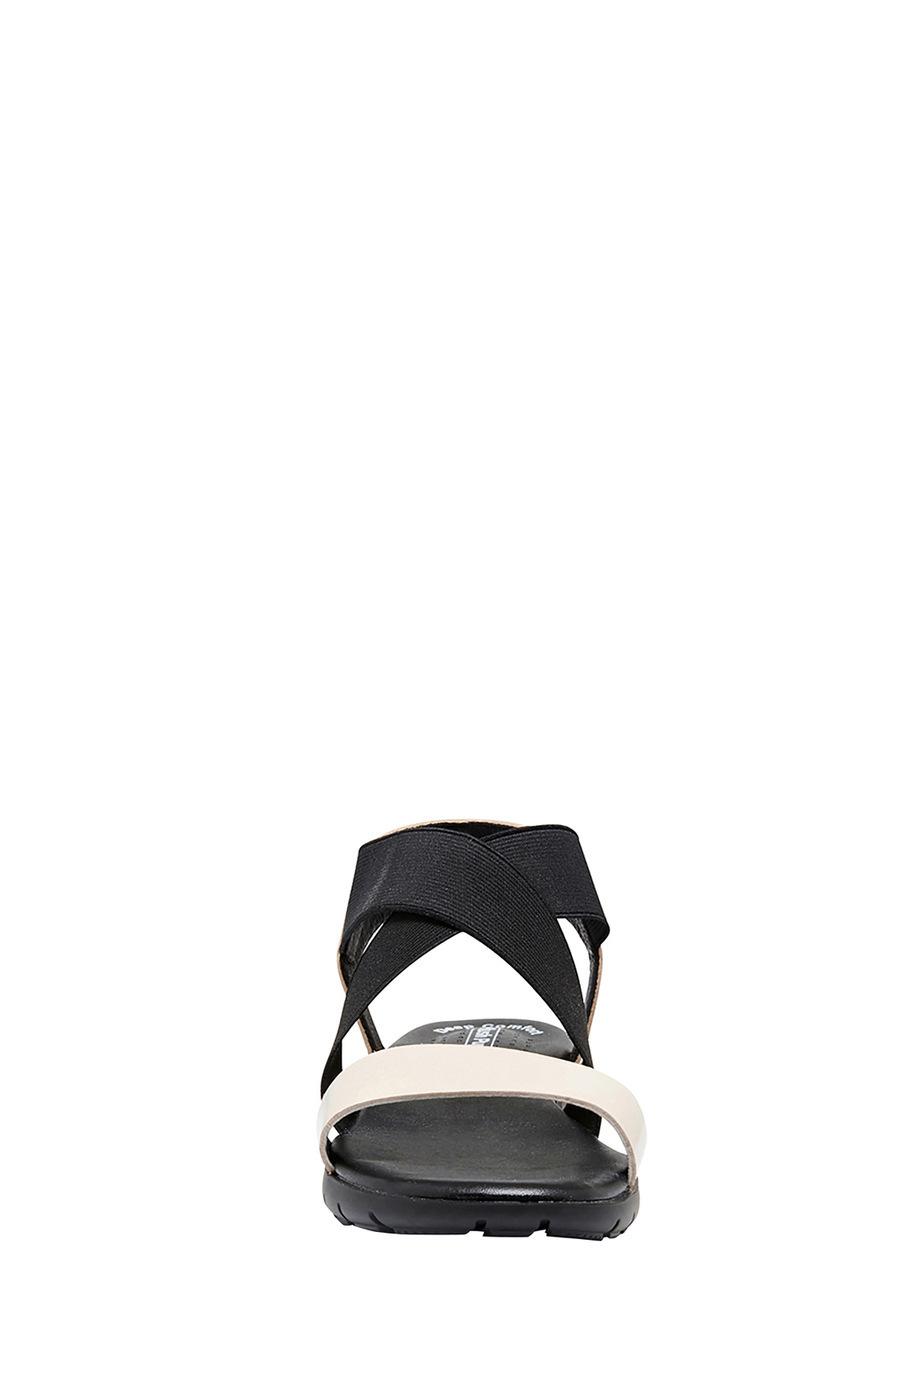 Black sandals myer - Myer Online Categoryname